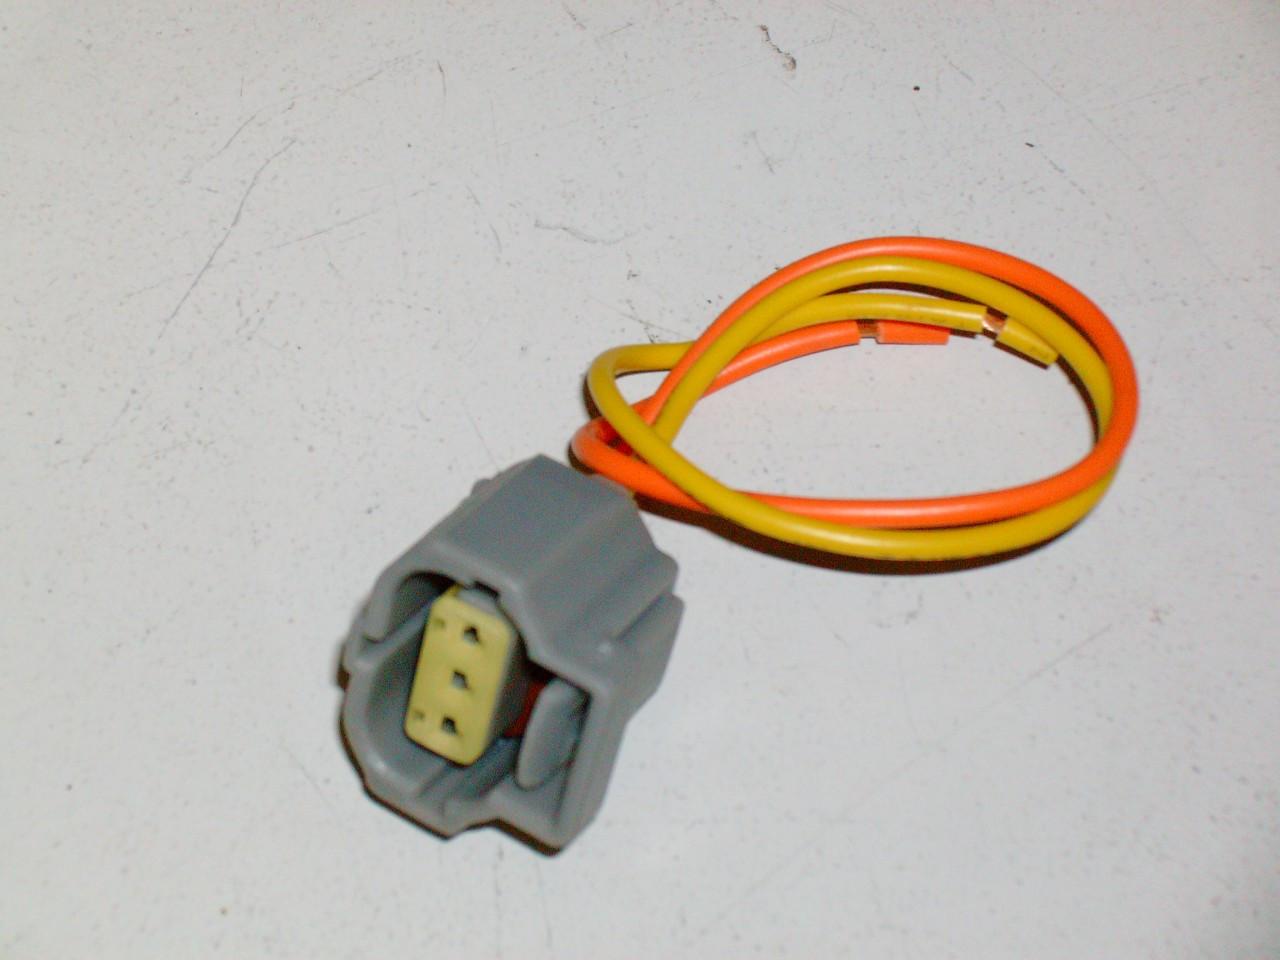 Alternator Wiring Diagram Also 1999 Ford Wiring Harness Wiring